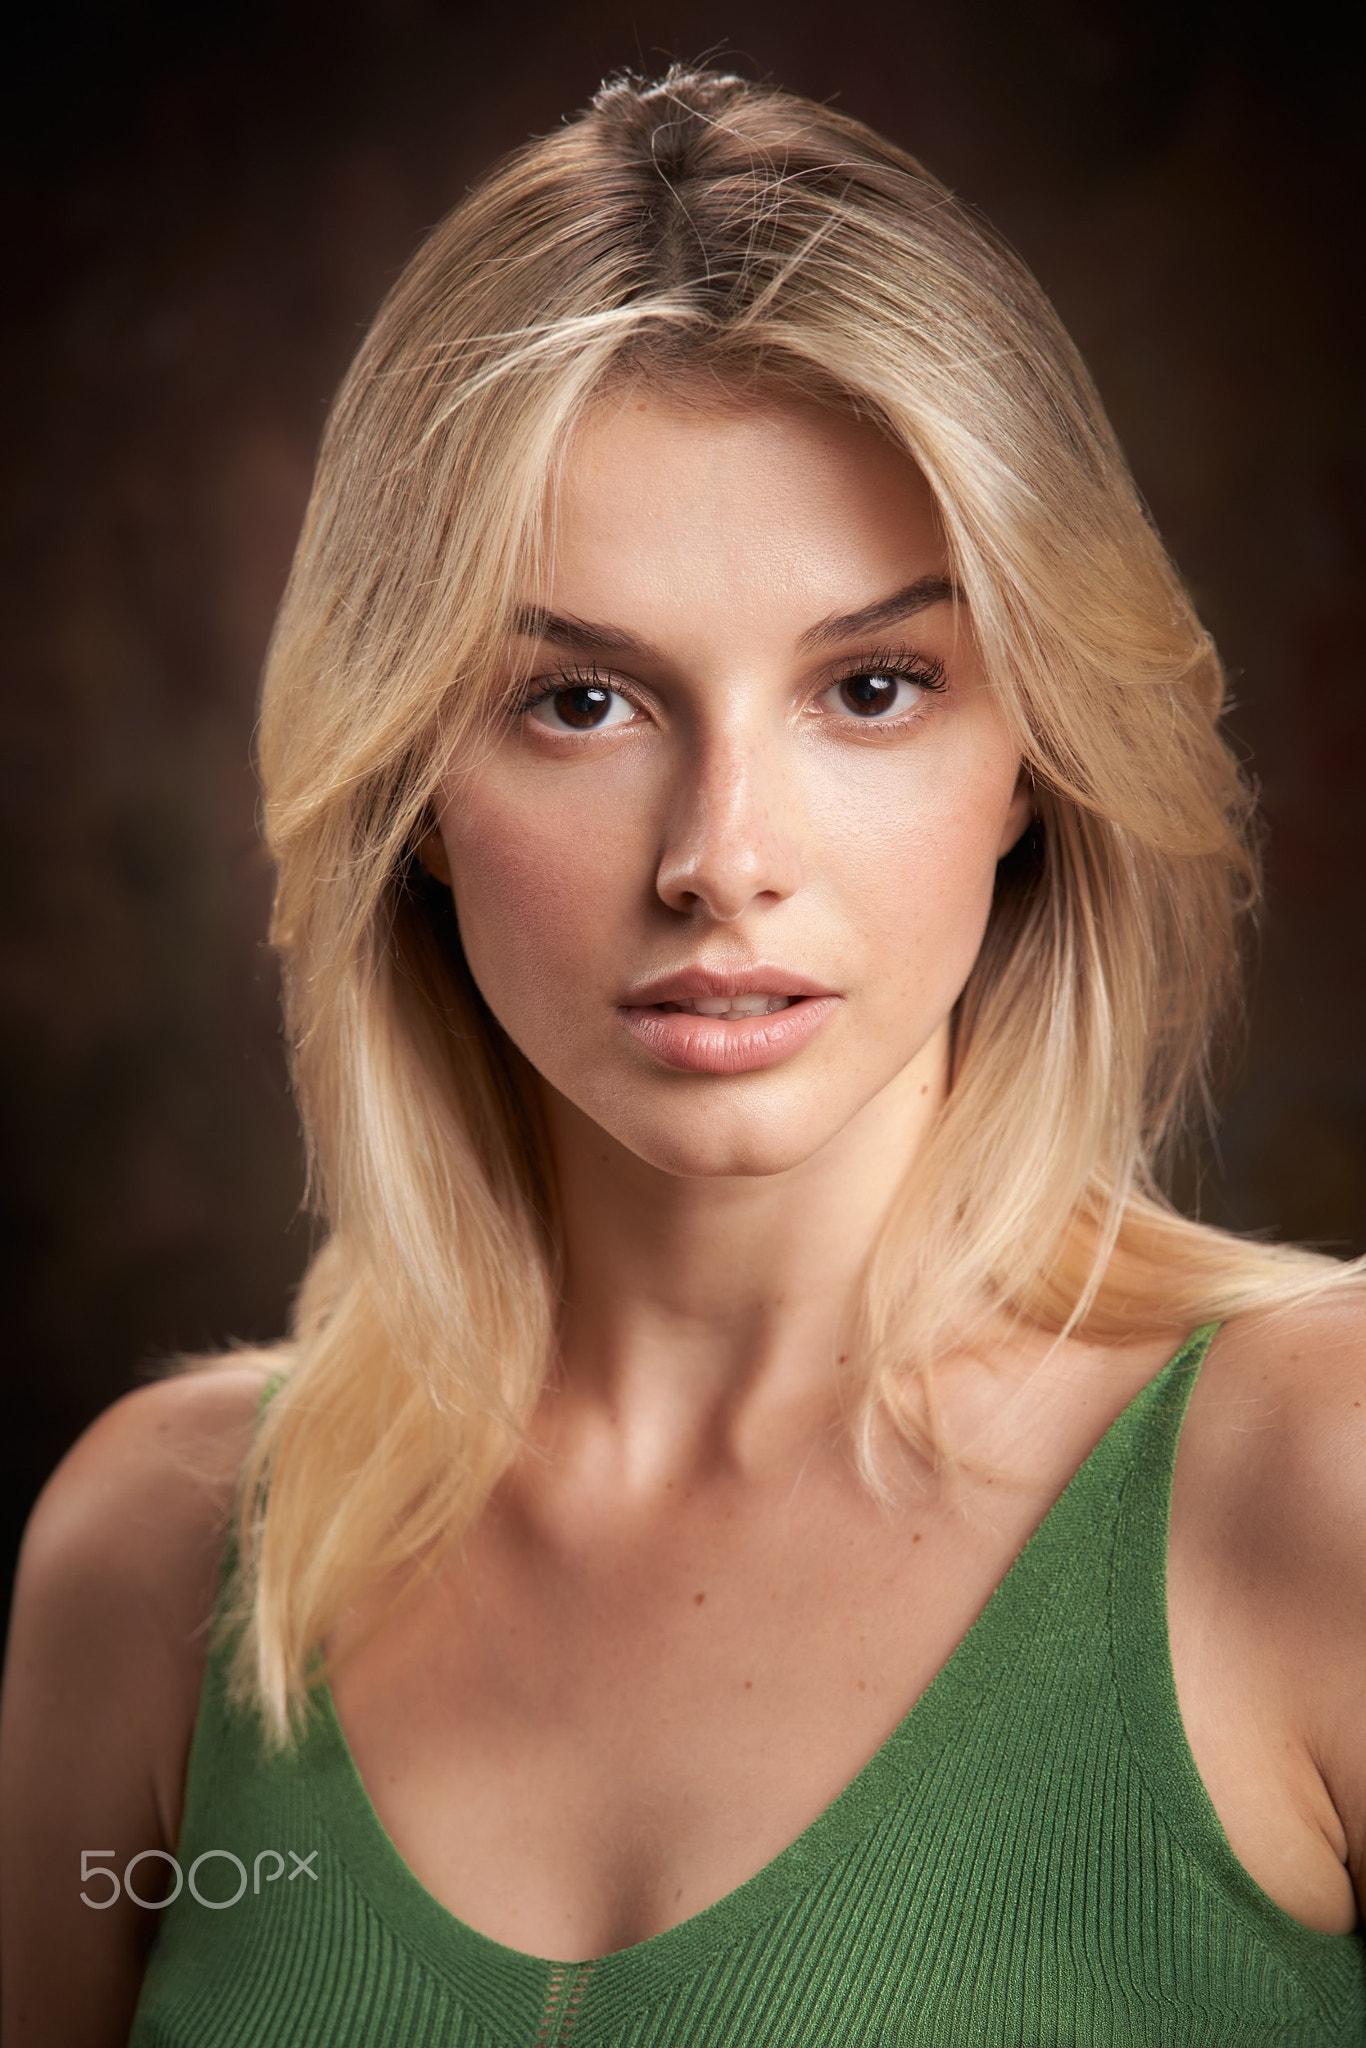 Alexander Vinogradov Women Blonde Looking At Viewer Green Clothing Portrait Simple Background 1366x2048